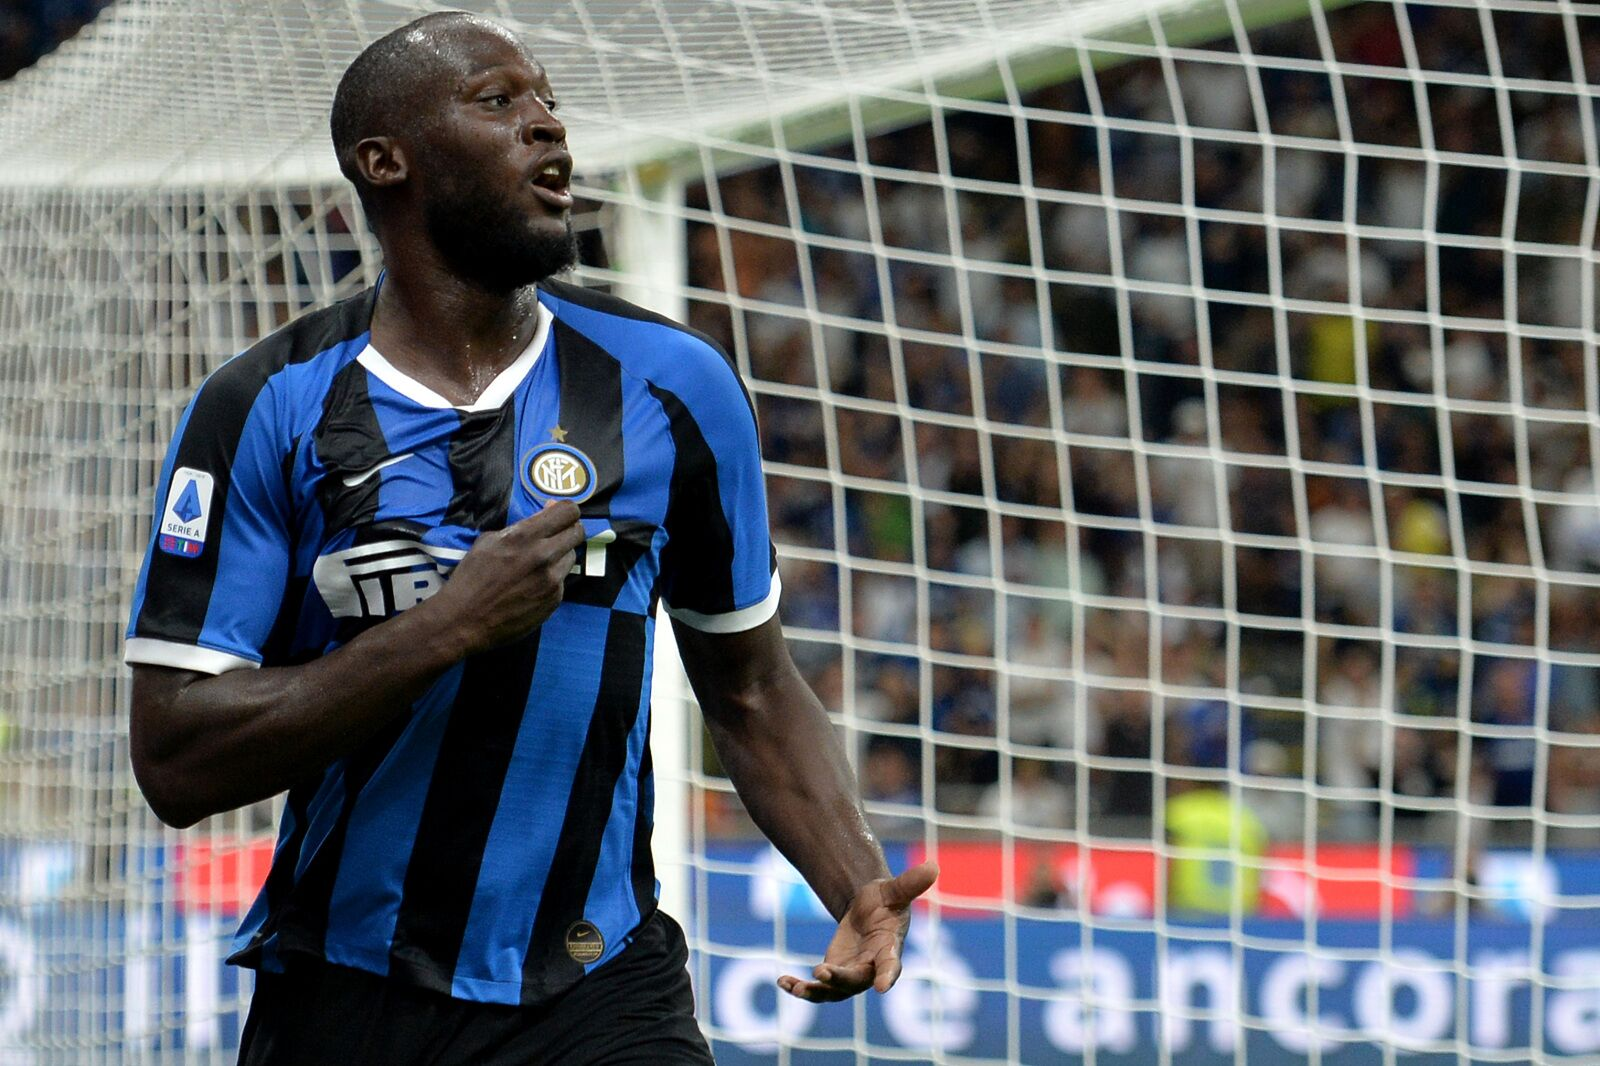 Former Premier League players like Lukaku now shine in Serie A